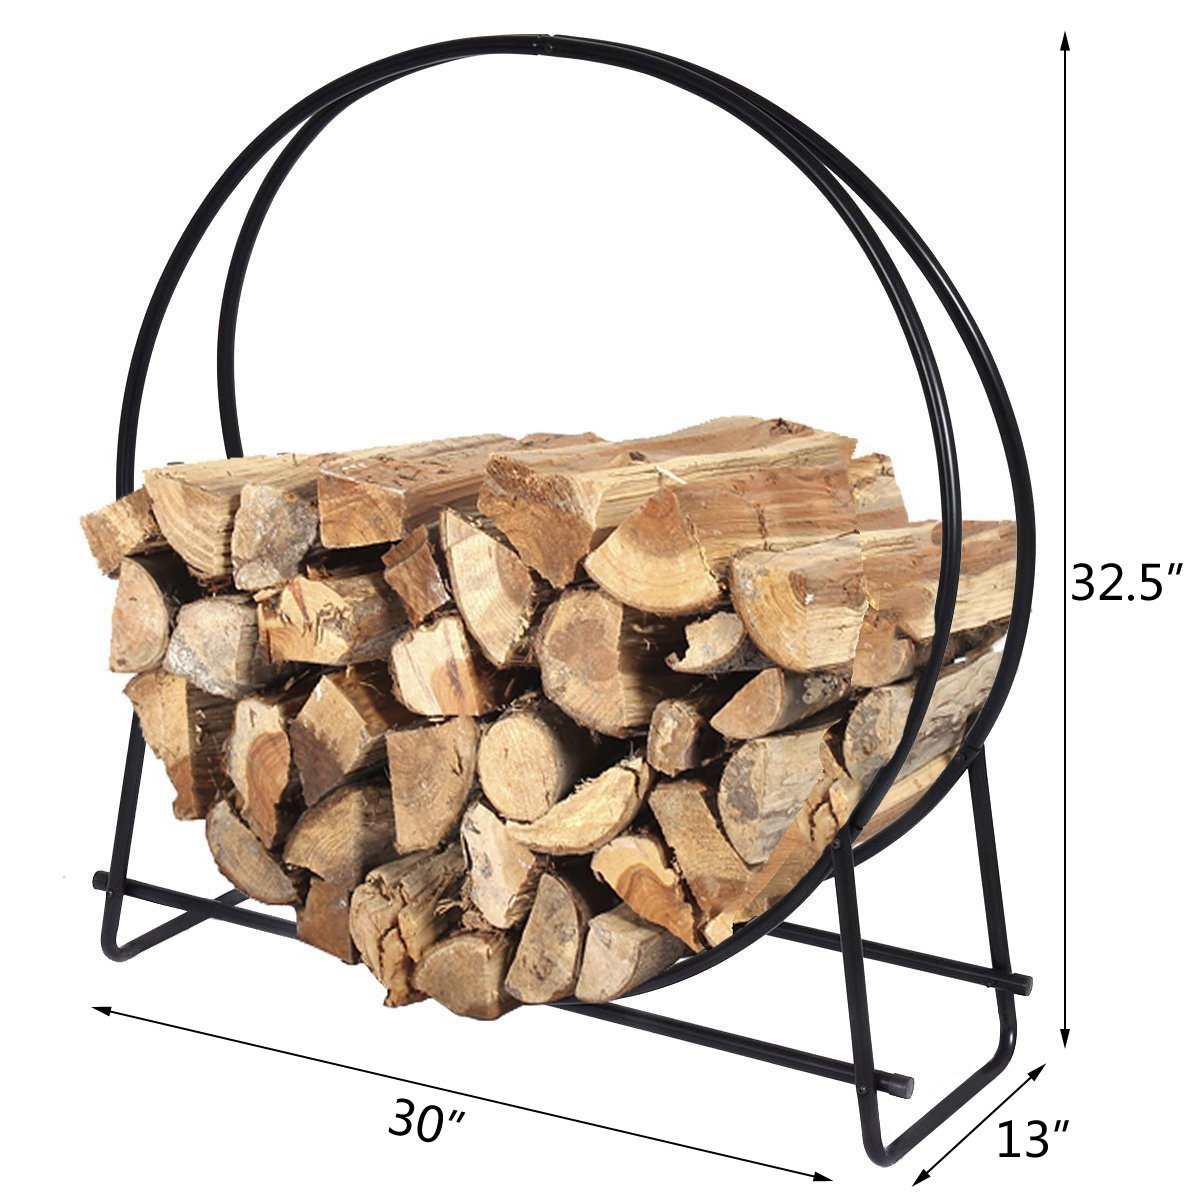 DOEWORKS 30 Inches Medium Round Steel Firewood Racks Heavy Duty Holder Log Rack Hoop by DOEWORKS